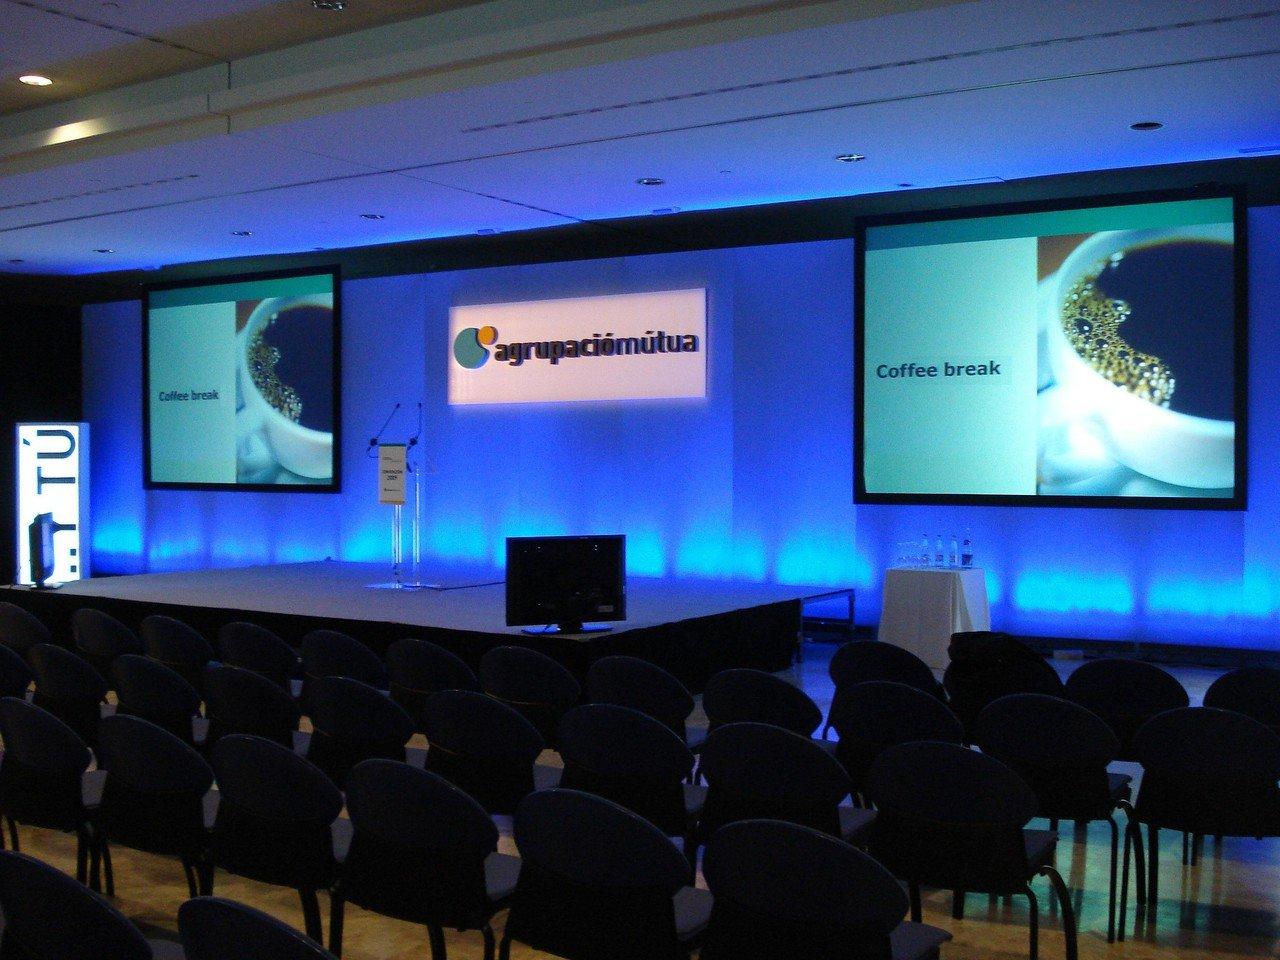 Barcelone seminar rooms Salle de réunion Agora 816 m2 meeting room image 1